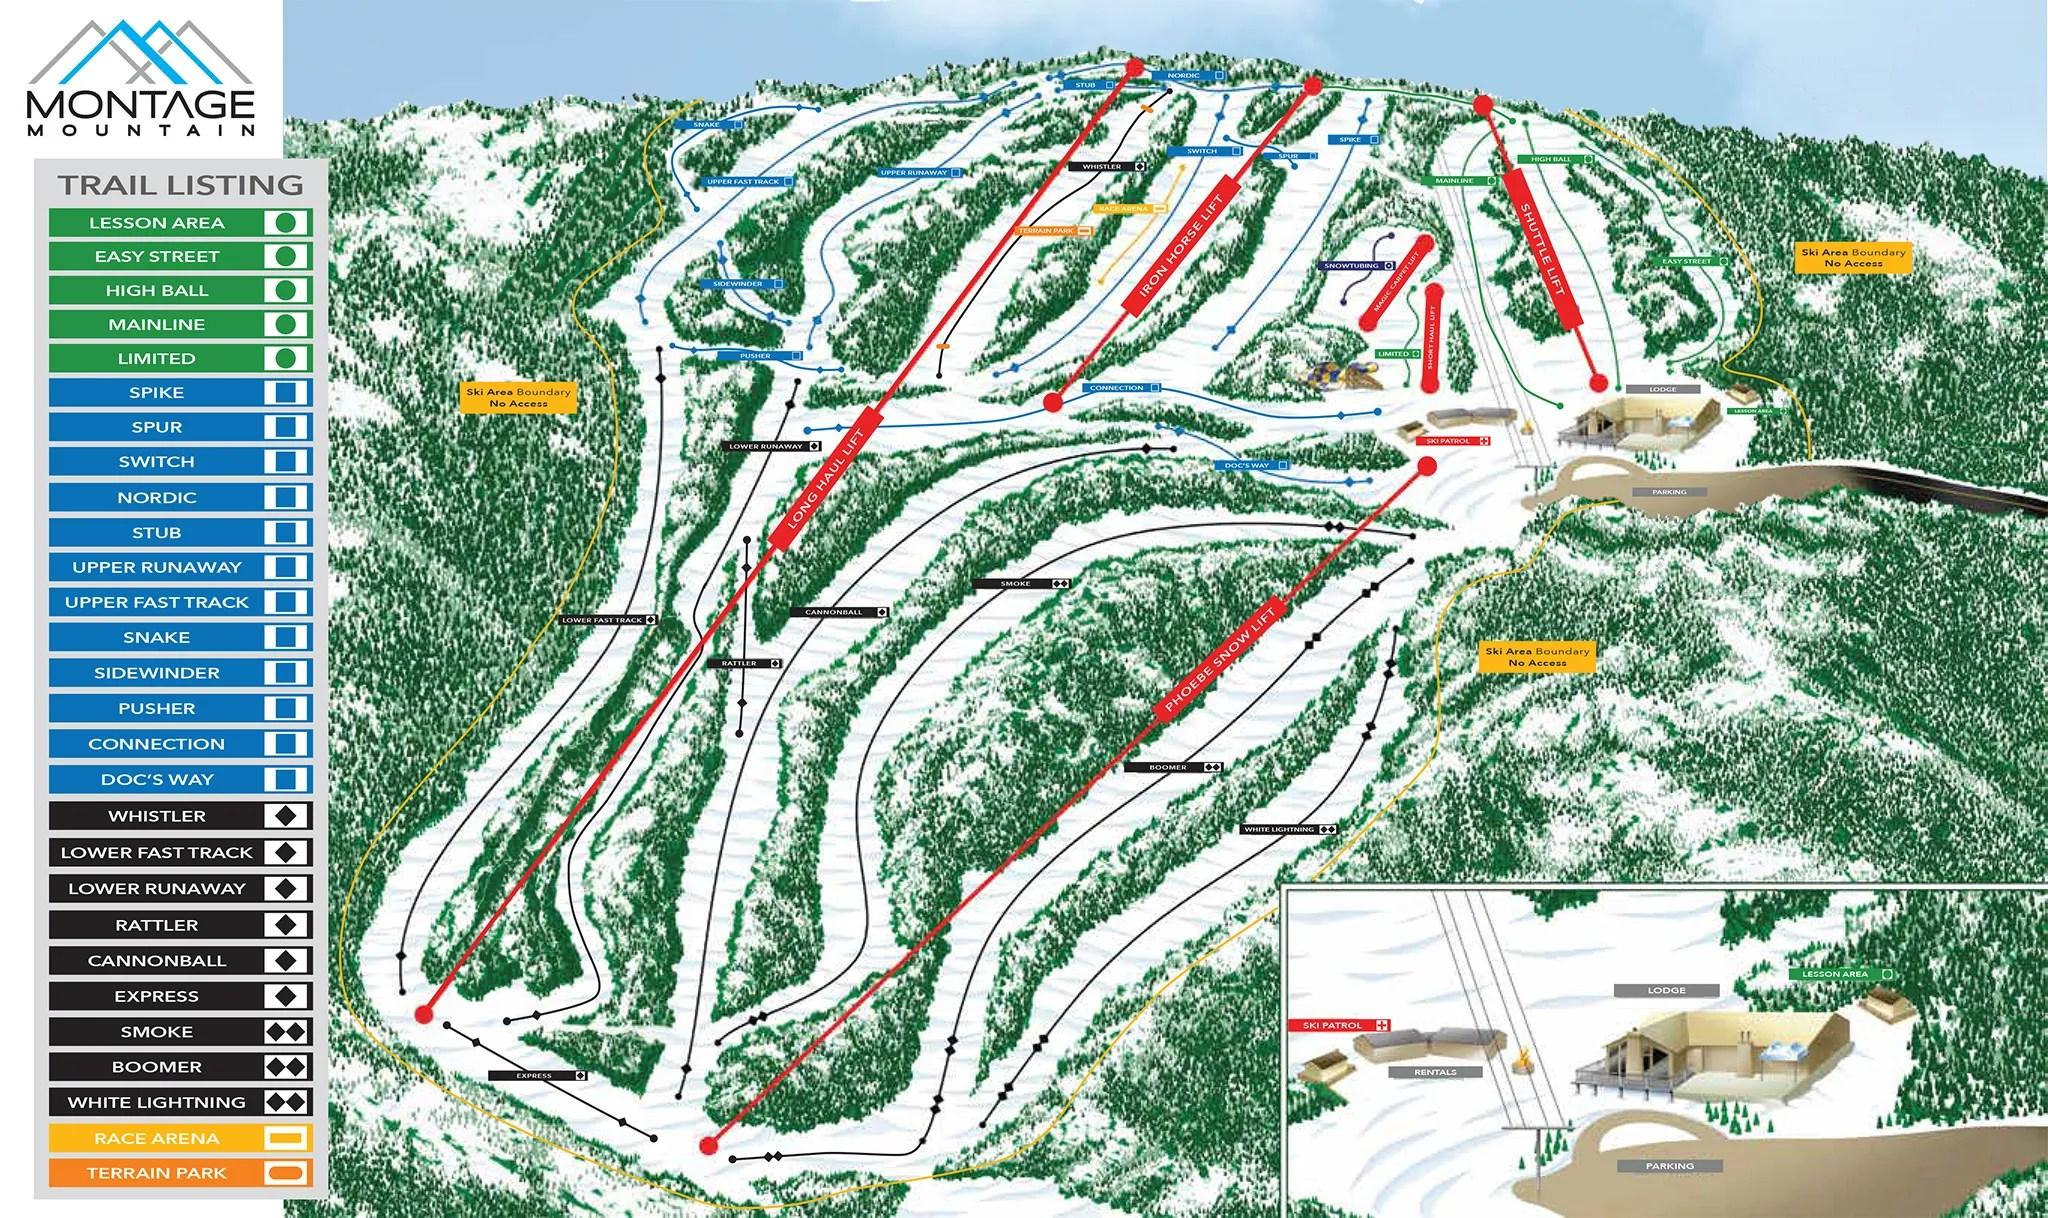 Skiing in the Poconos | Snow Report | Montage Mountain ... on home pennsylvania map, city pennsylvania map, ski slopes in pennsylvania, snow pennsylvania map, golf pennsylvania map, ski resorts in pa, skiing in pennsylvania map, montage mountain trail map, ski mountains in pennsylvania, skiing in pocono pa map, hunting pennsylvania map, drifting pennsylvania map, mountain pennsylvania map, ski big bear pennsylvania,